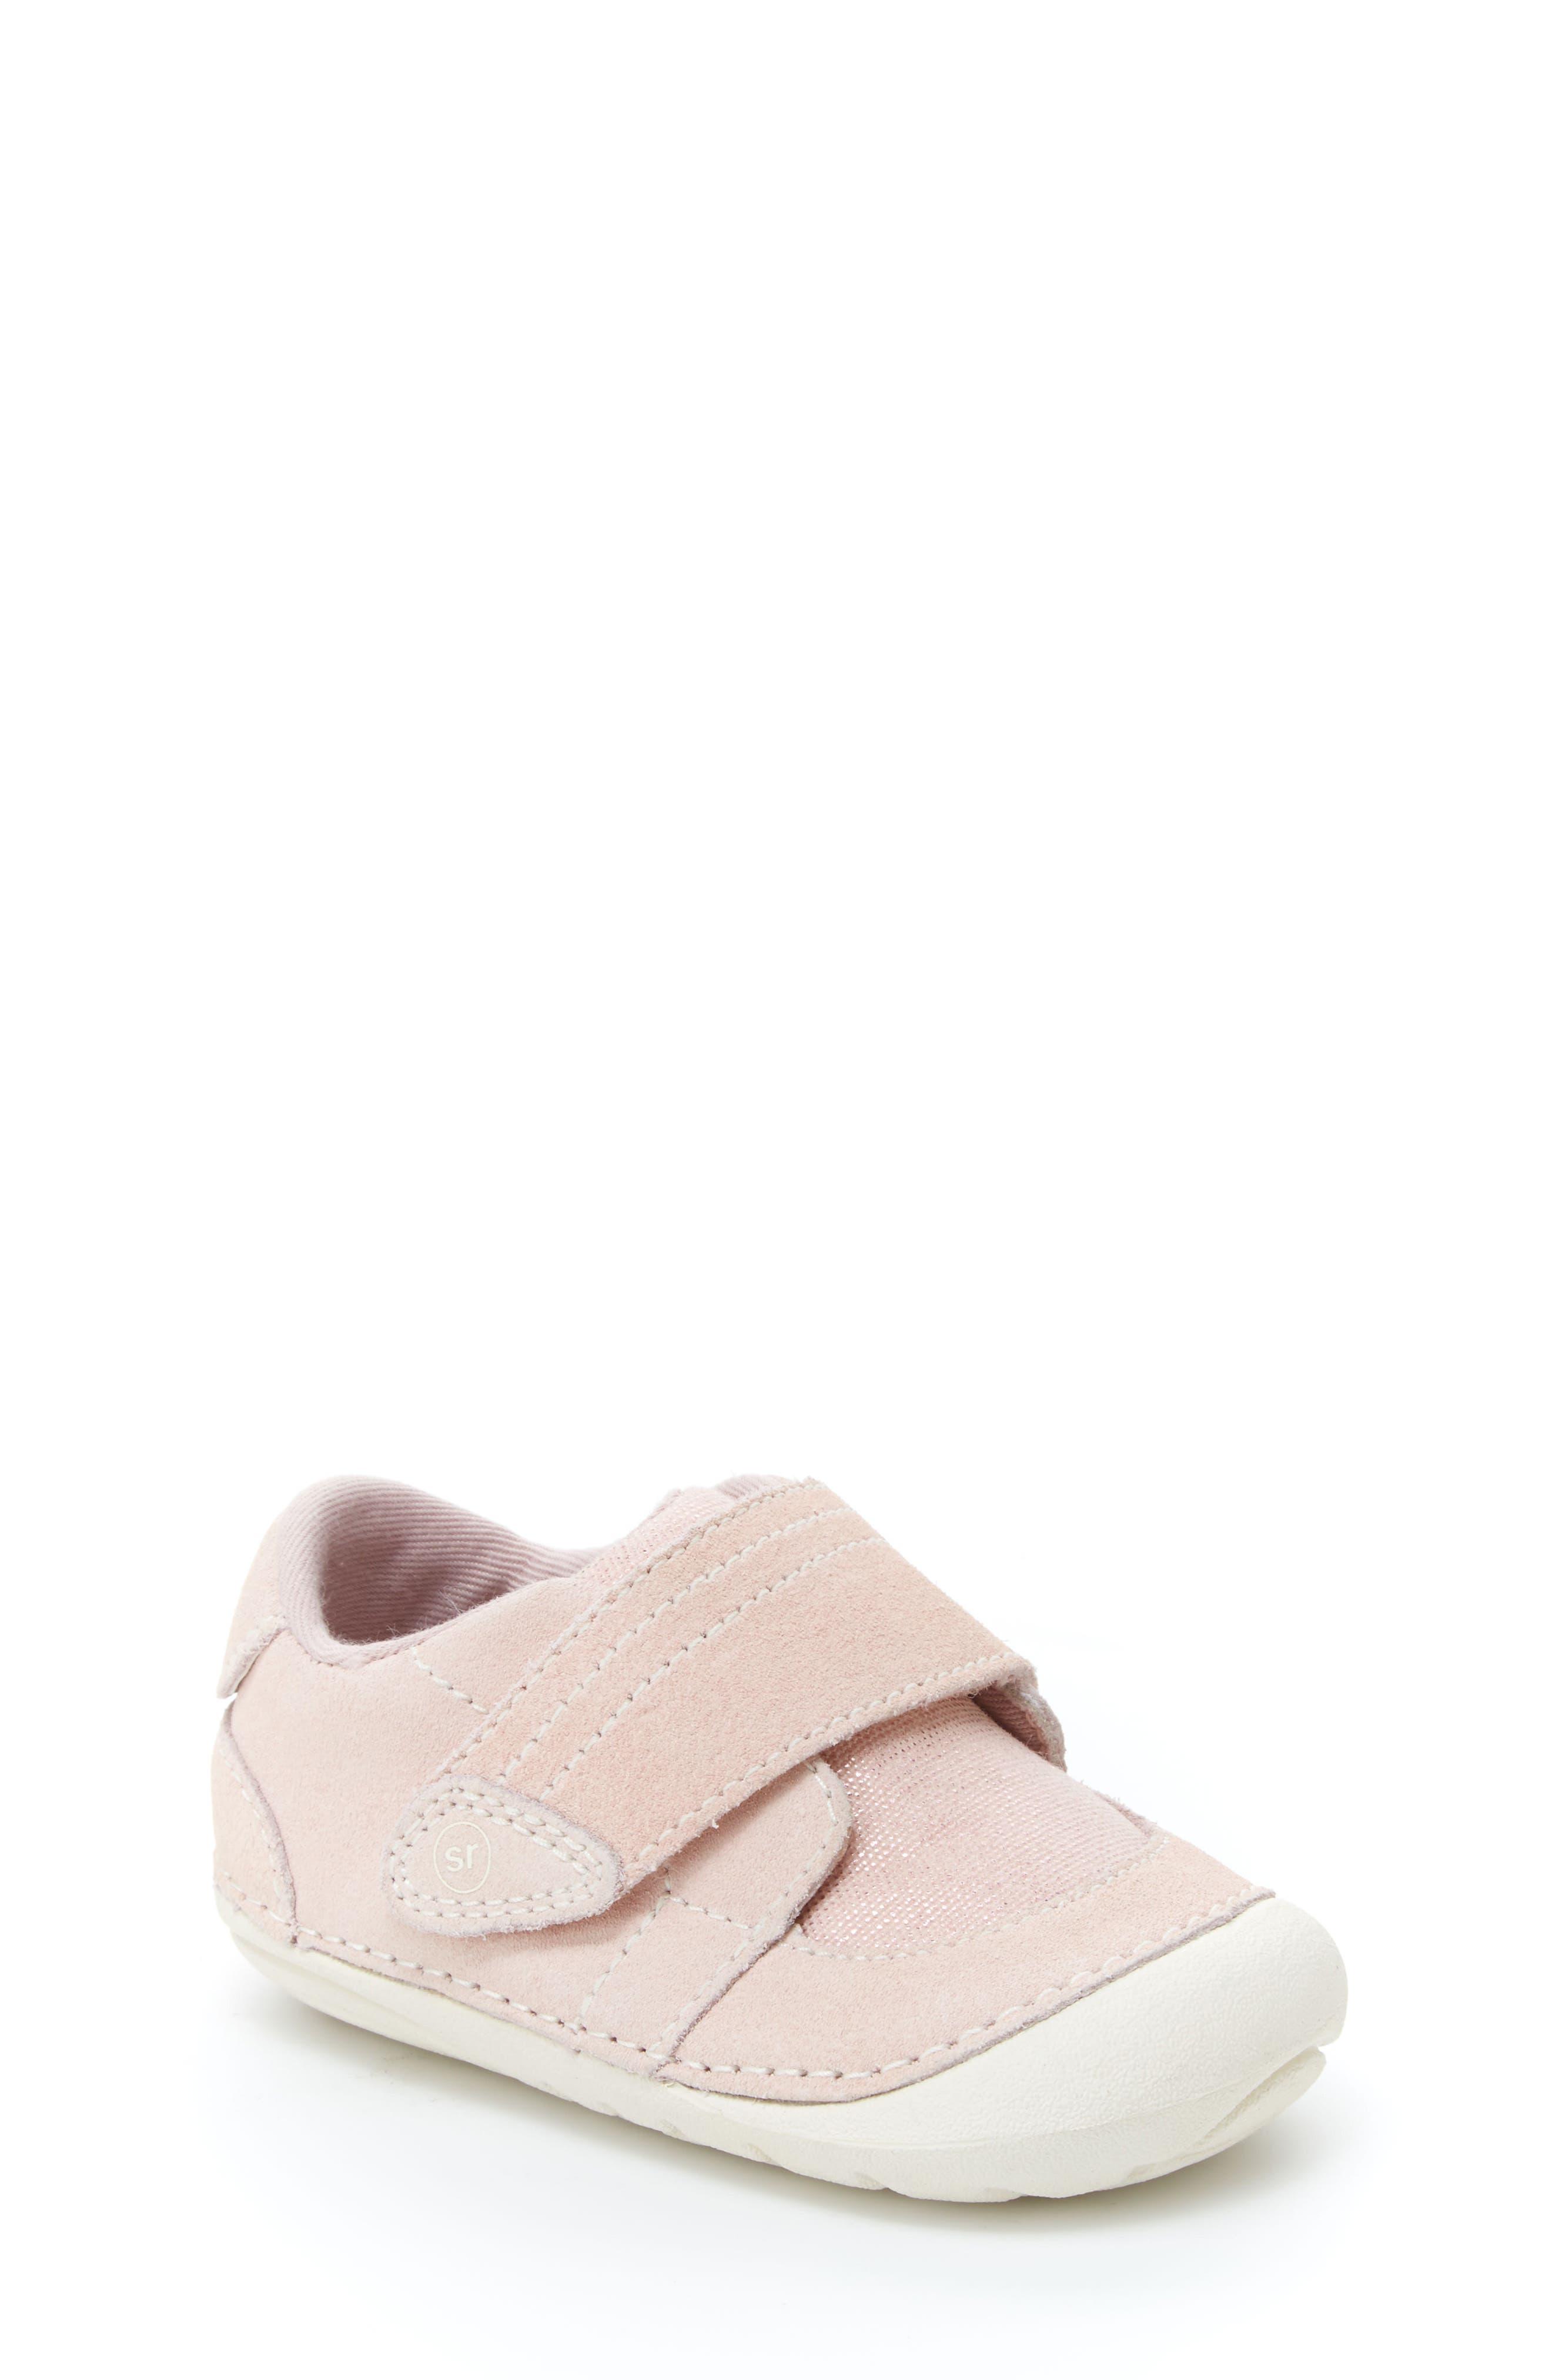 Soft Motion Kellen Sneaker,                         Main,                         color, 650